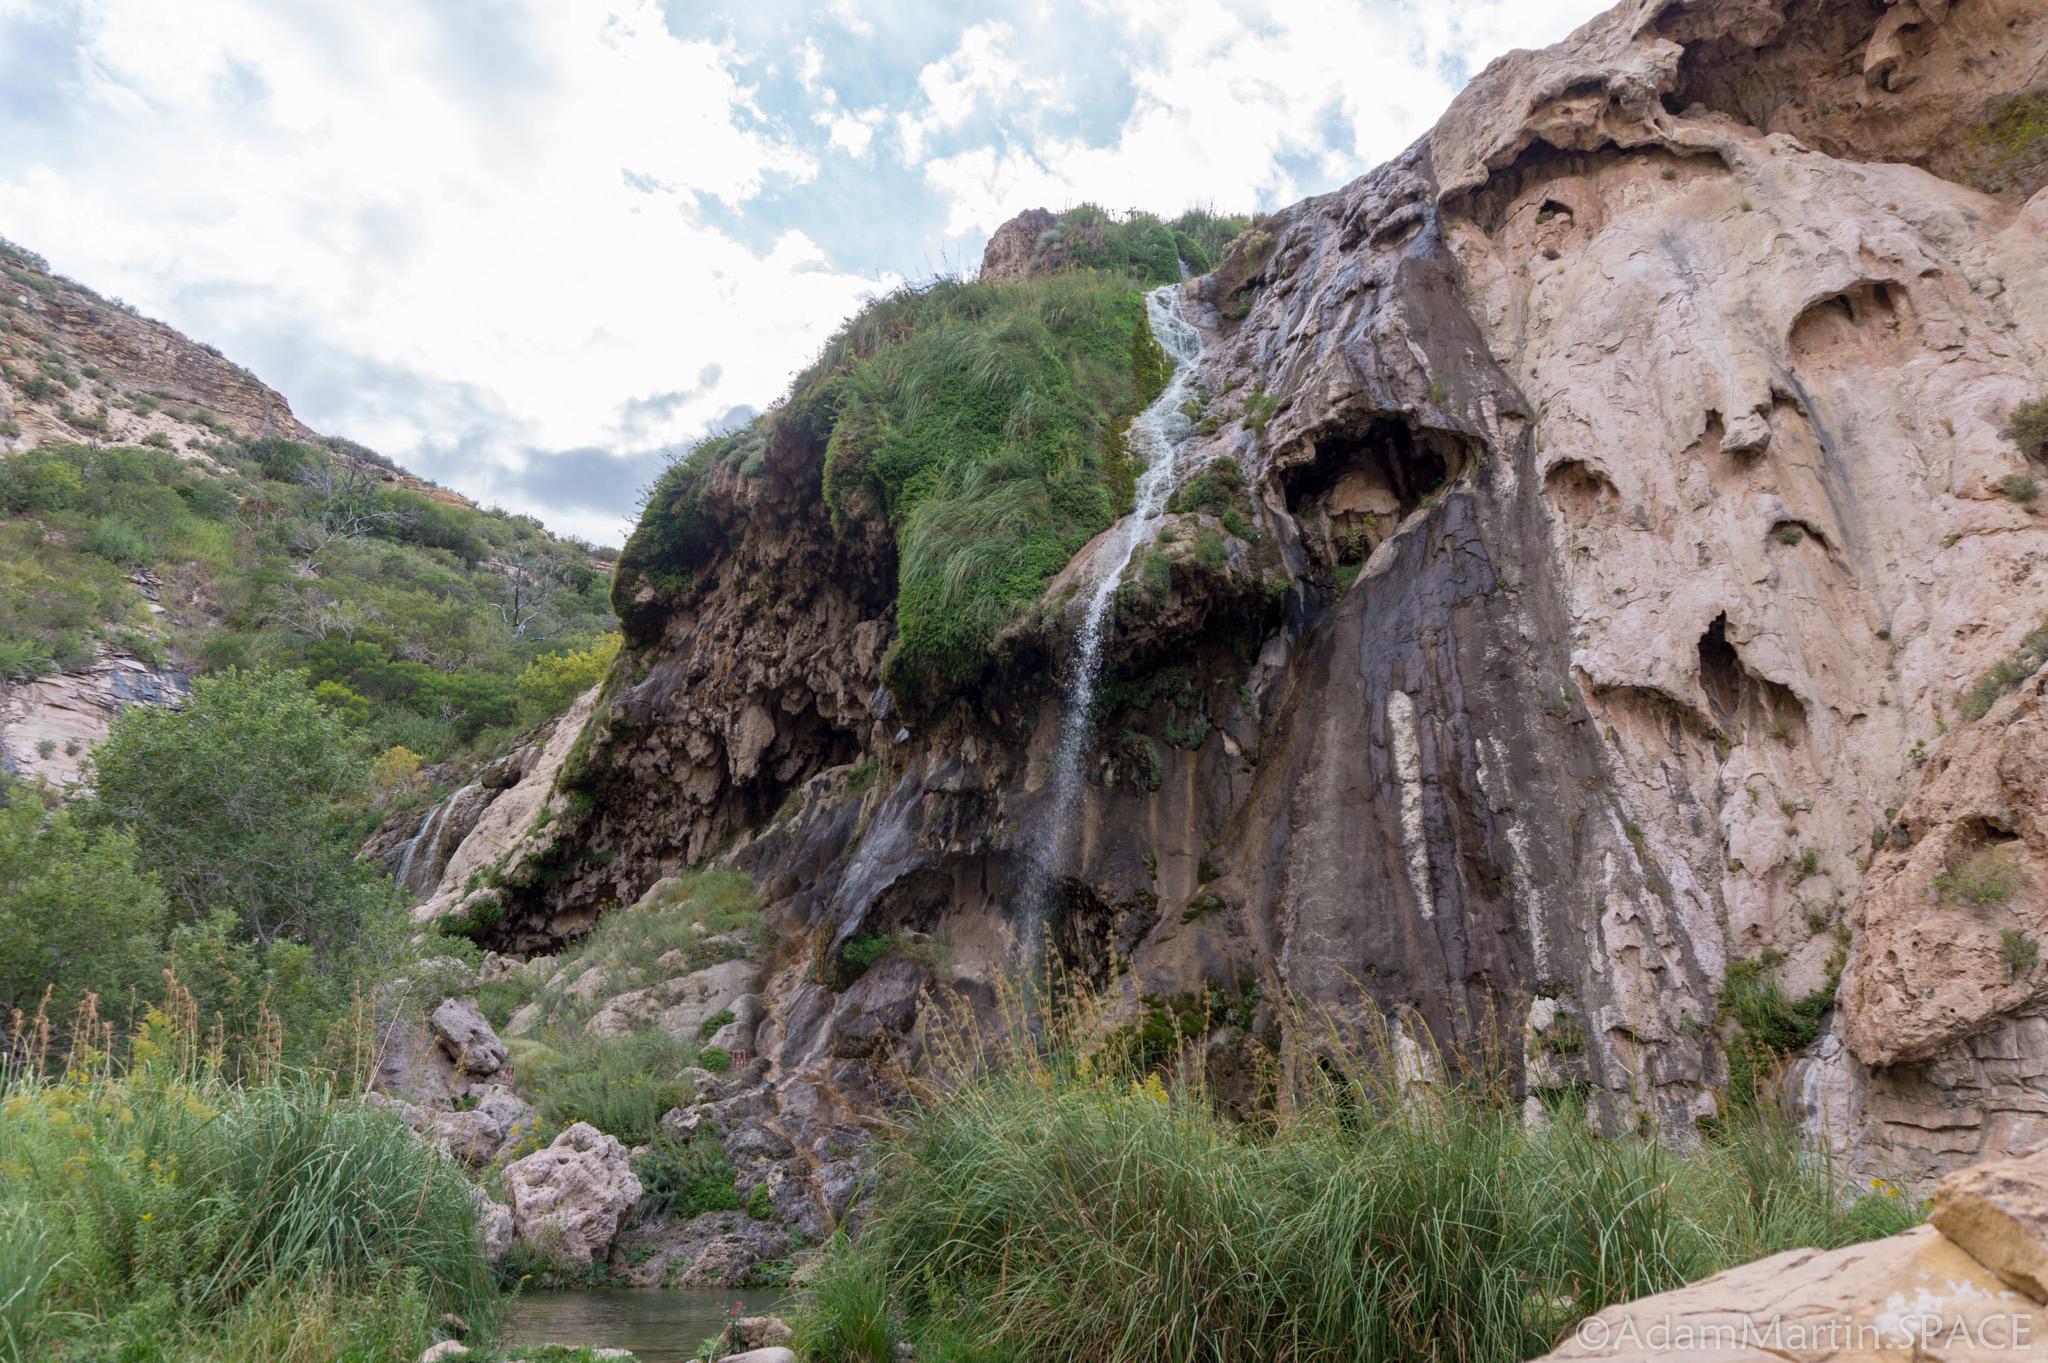 Sitting Bull Falls - Main Falls